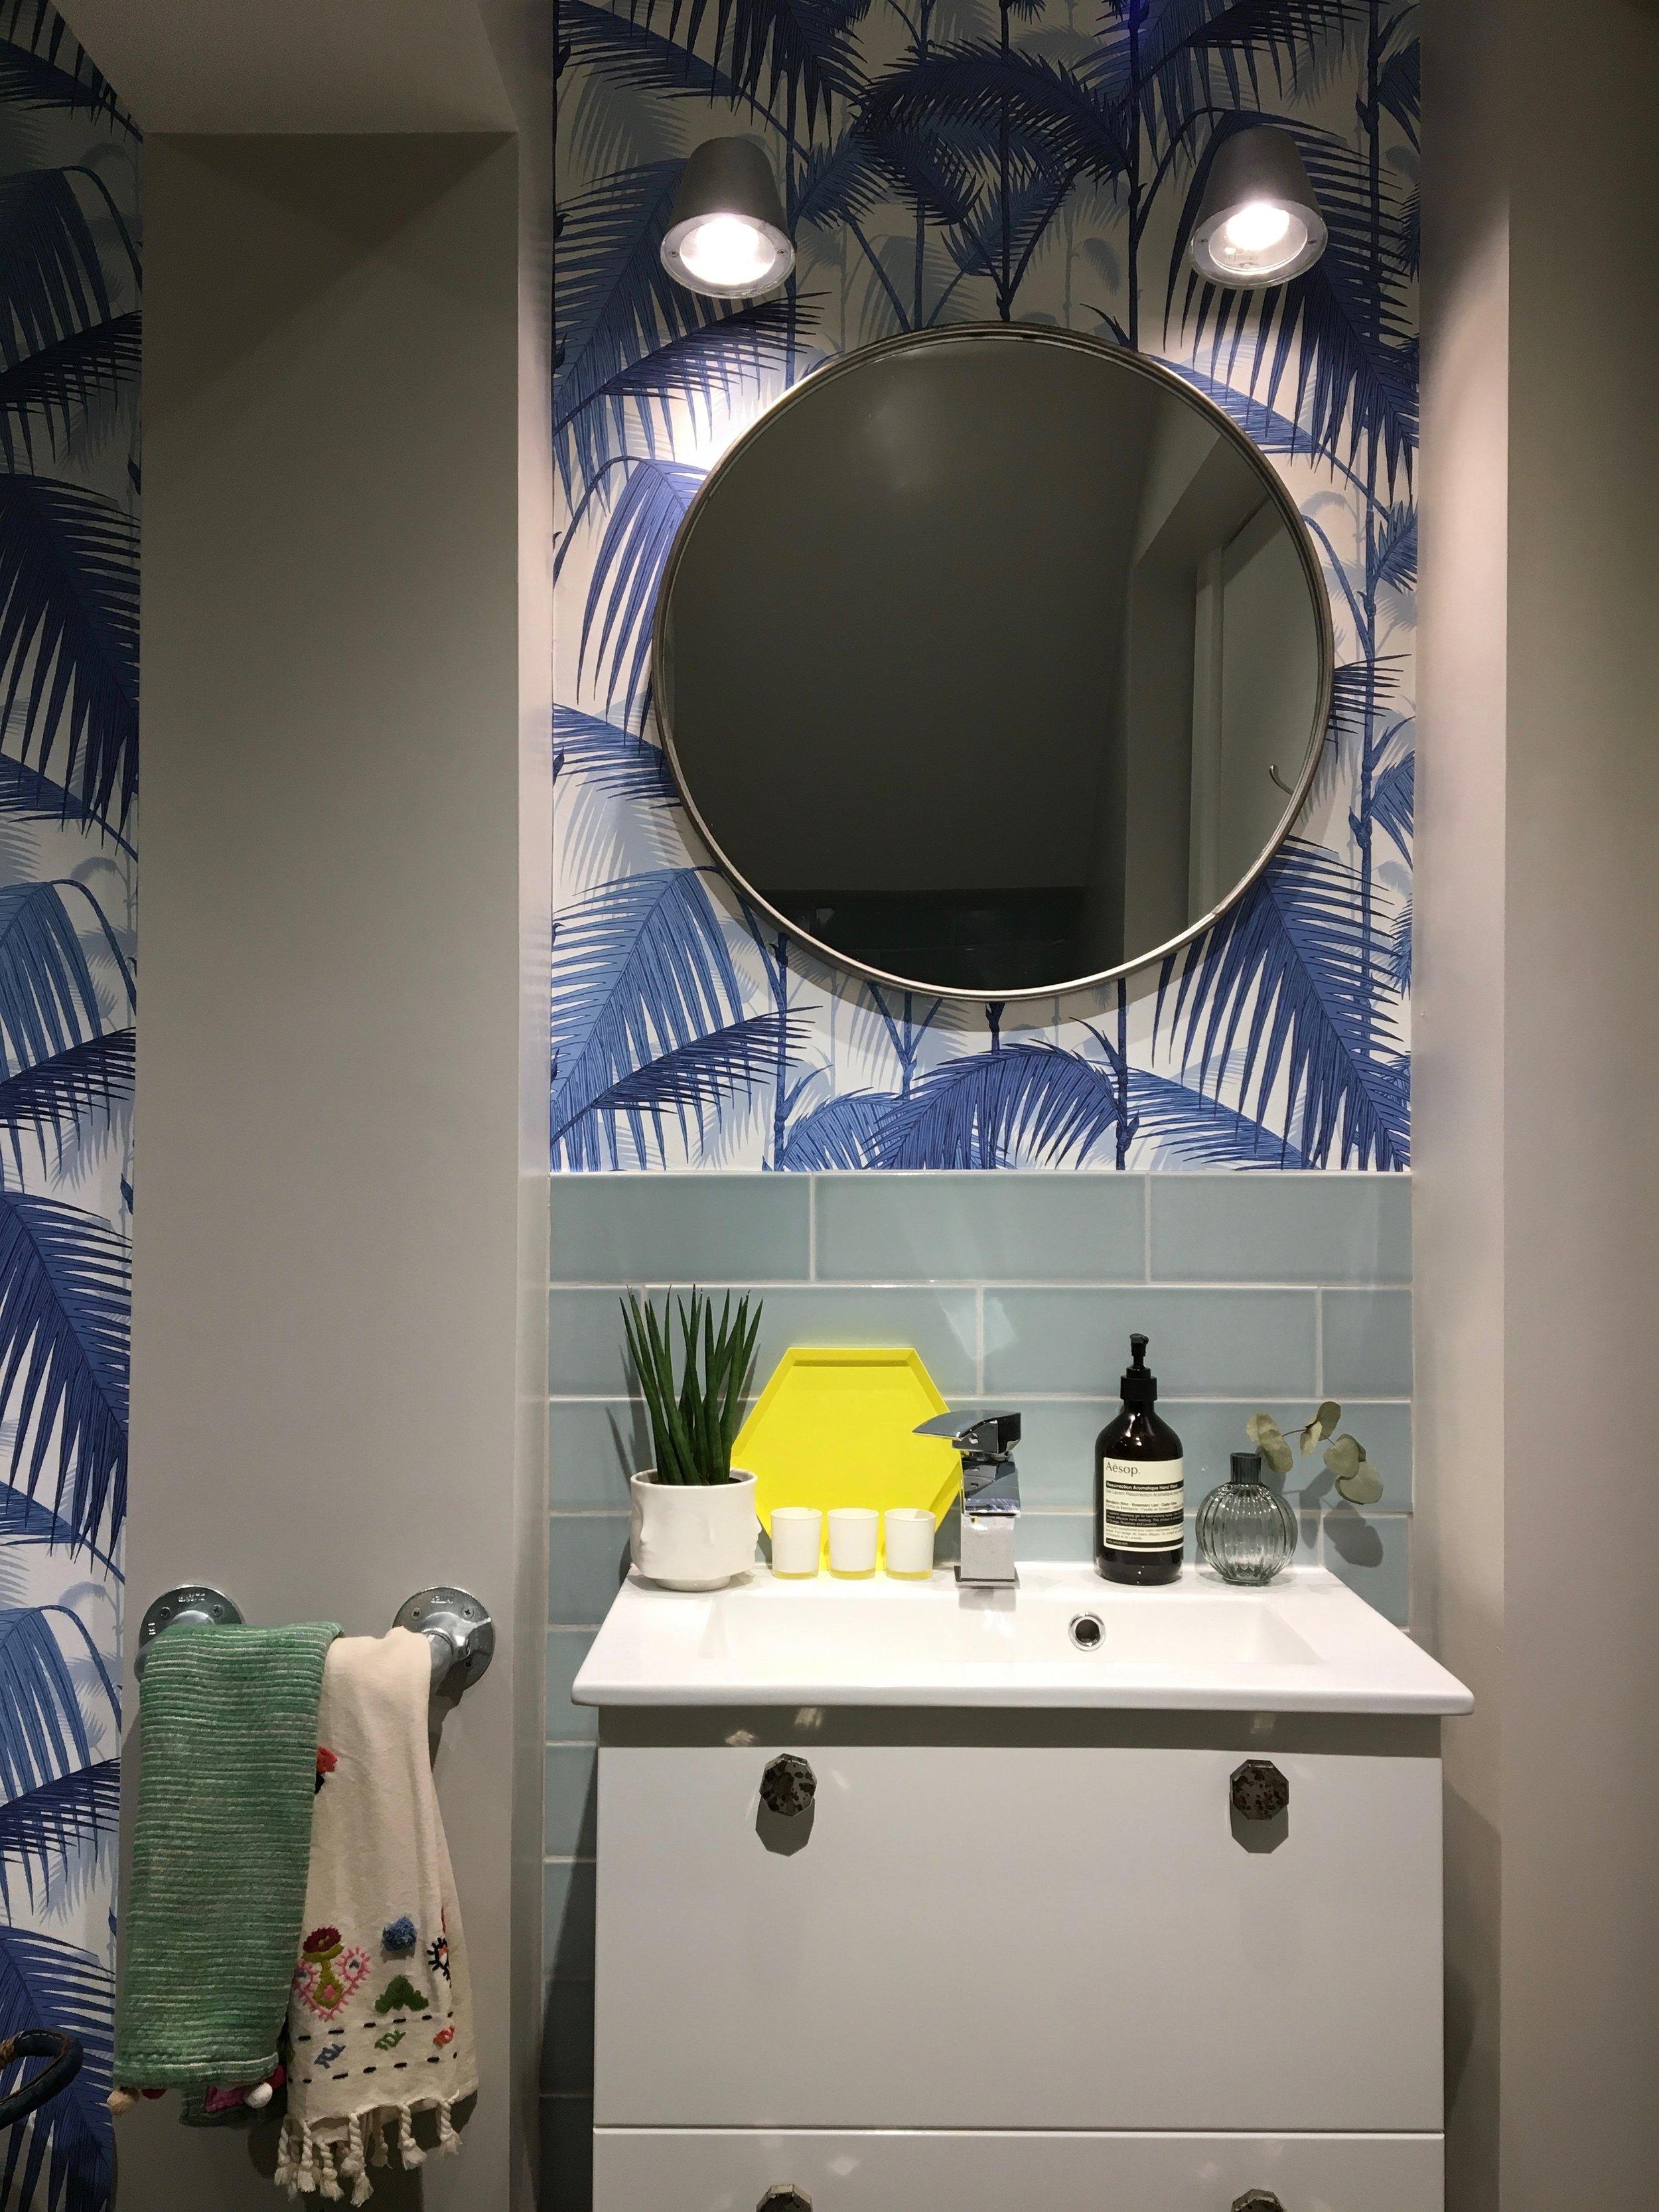 Liznylon_bathroom_with_cole_and_son_wallpaper_blue.jpg